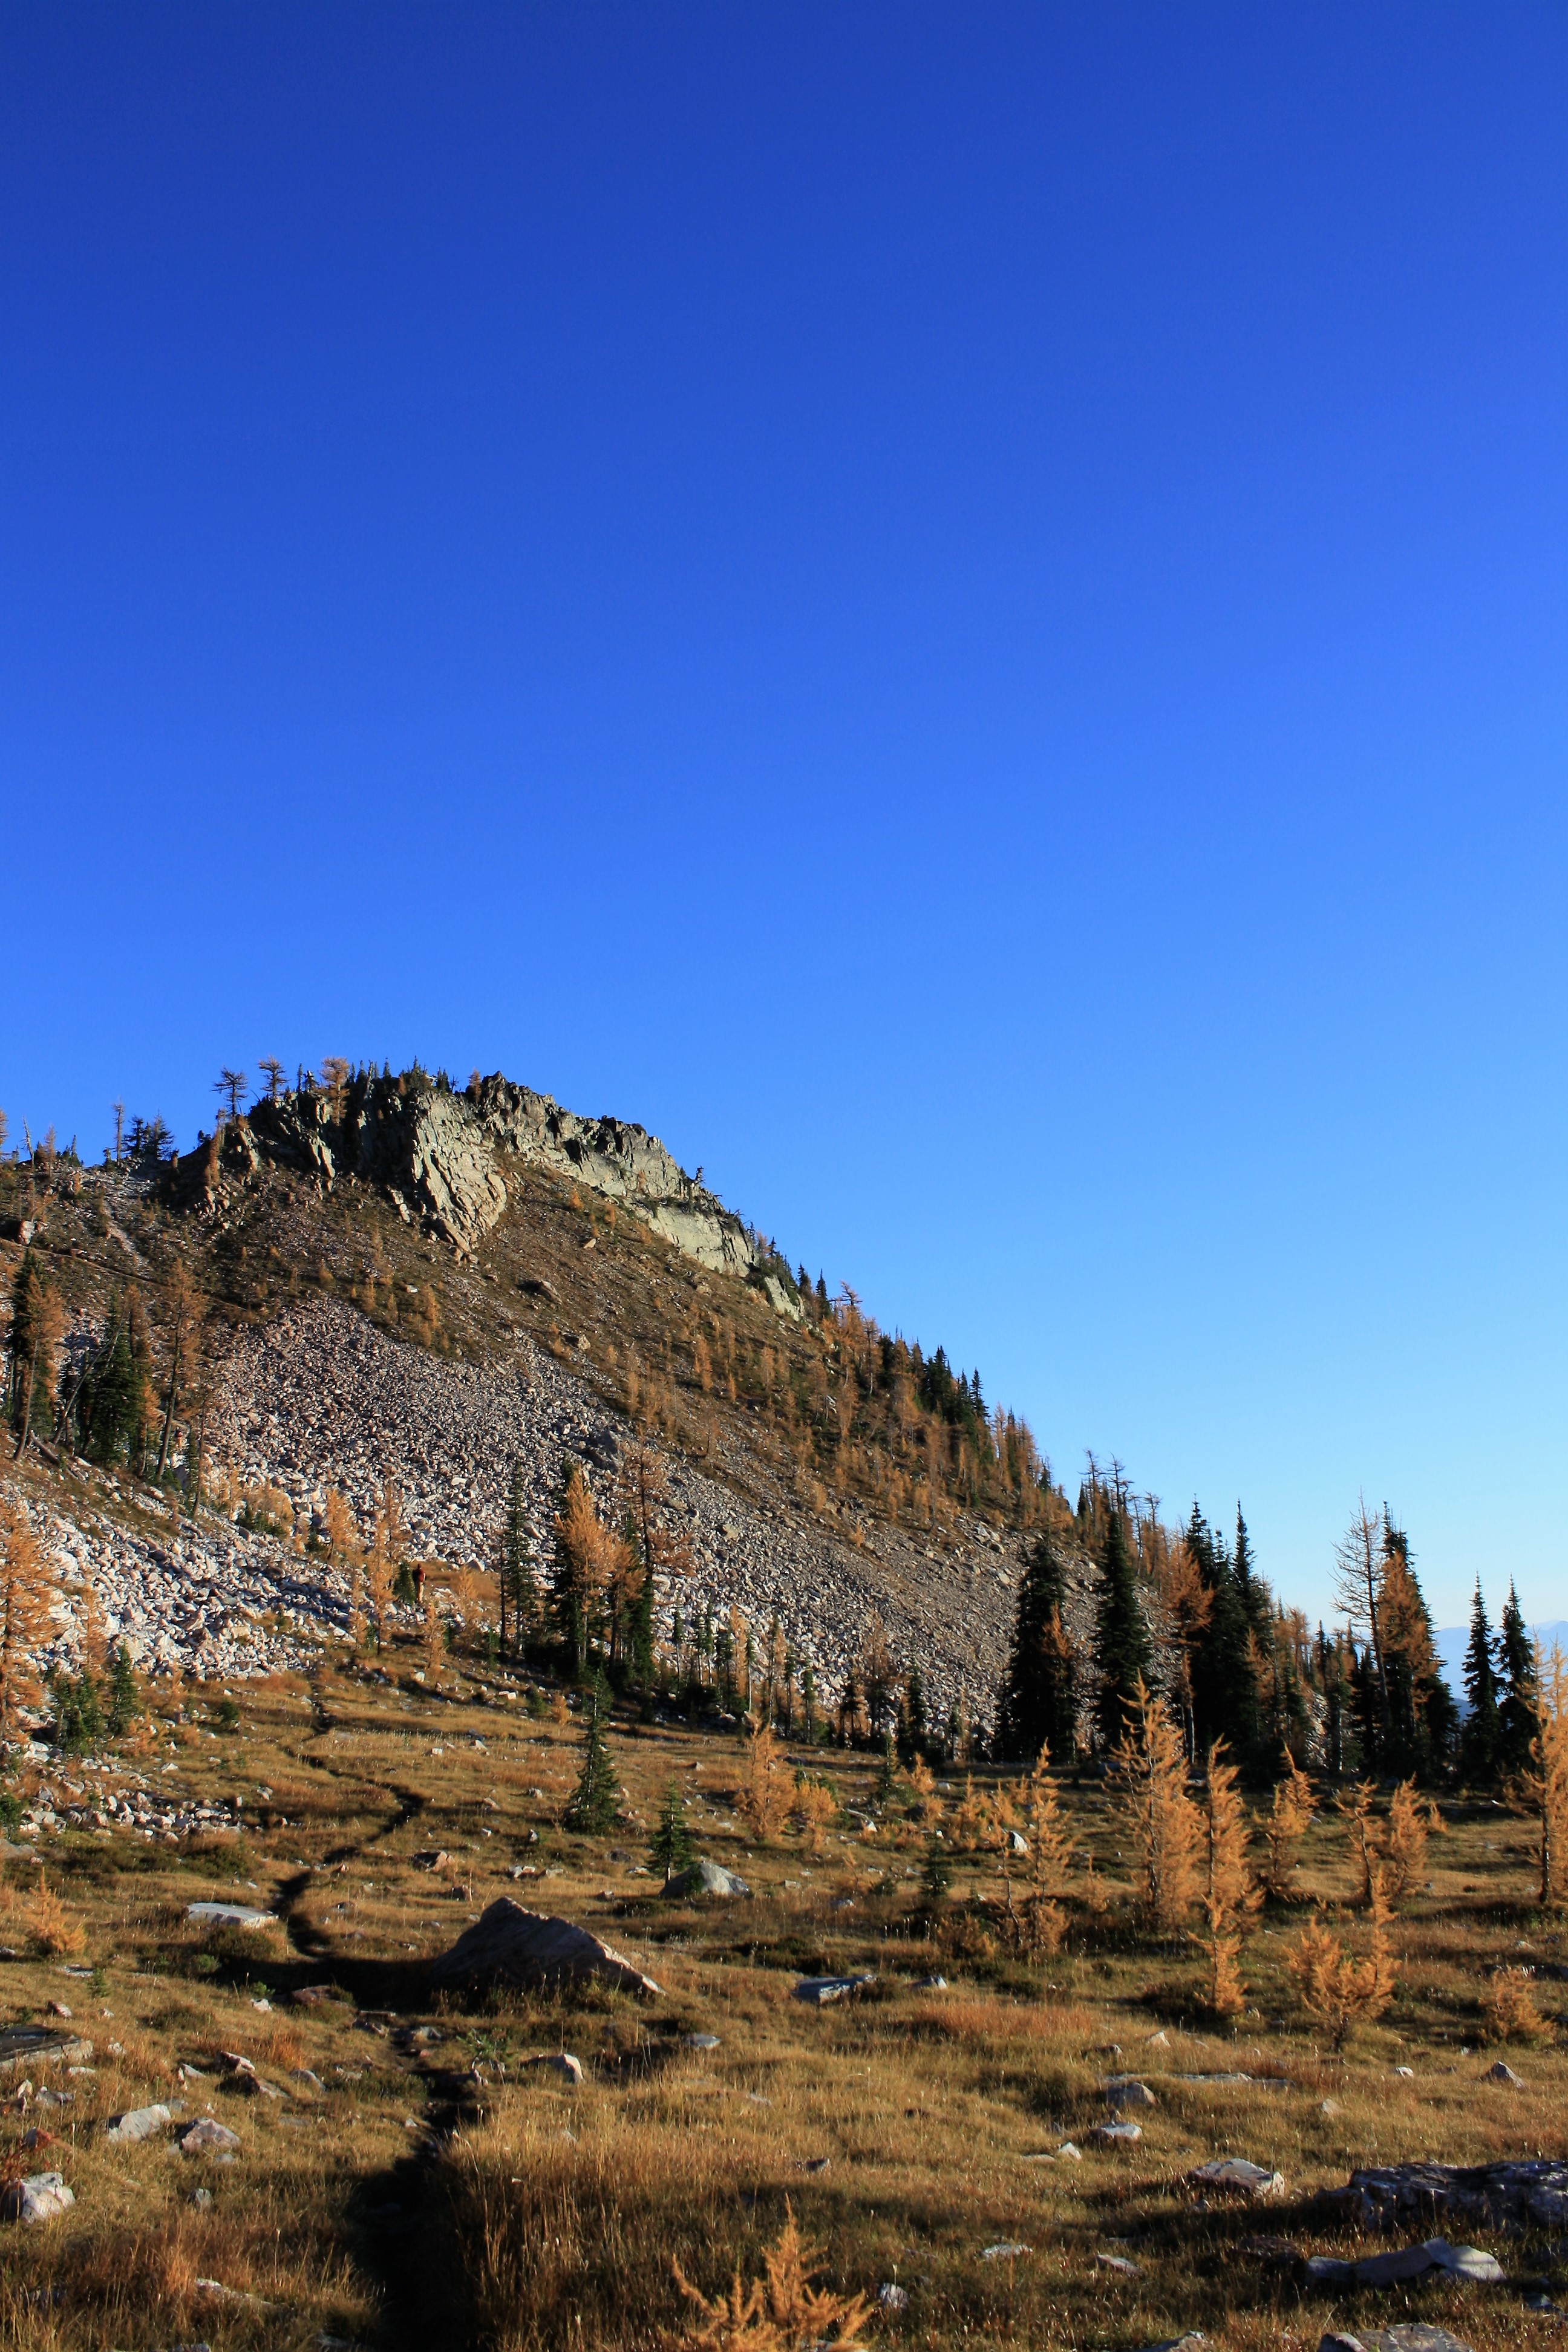 DM_nature_landscape_plaidlake_0526